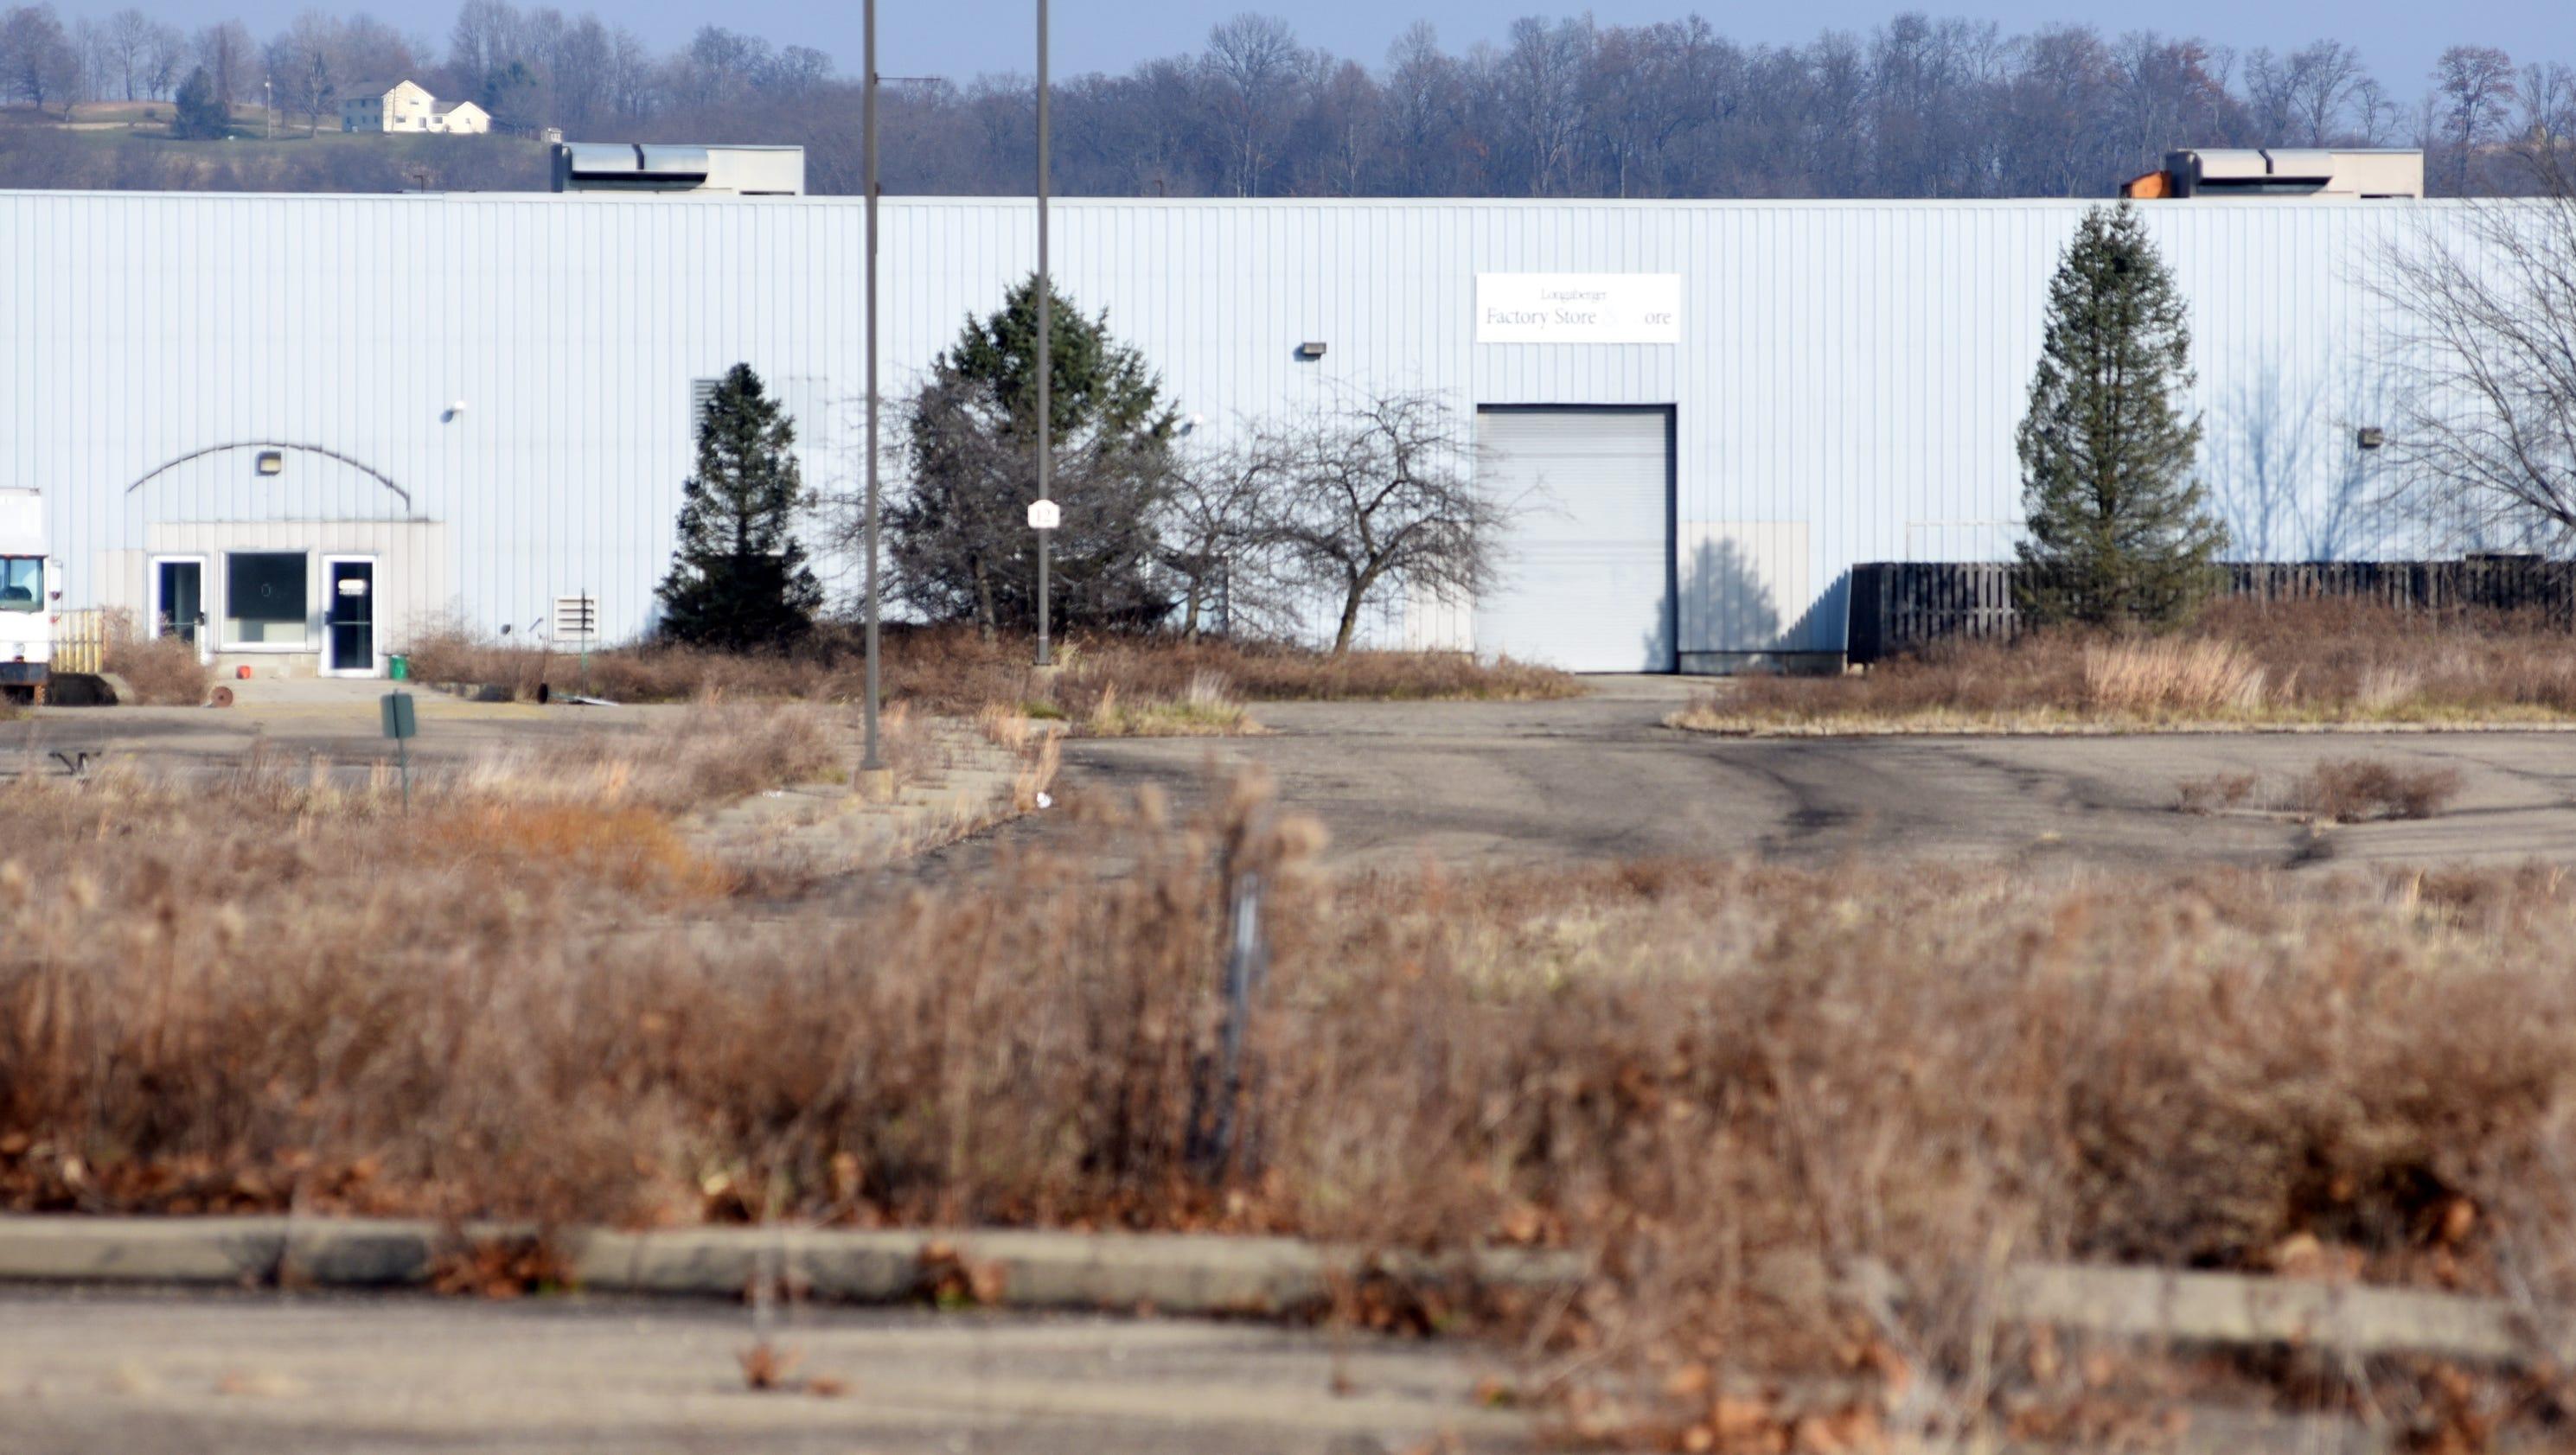 Mattress manufacturer purchases Longaberger properties